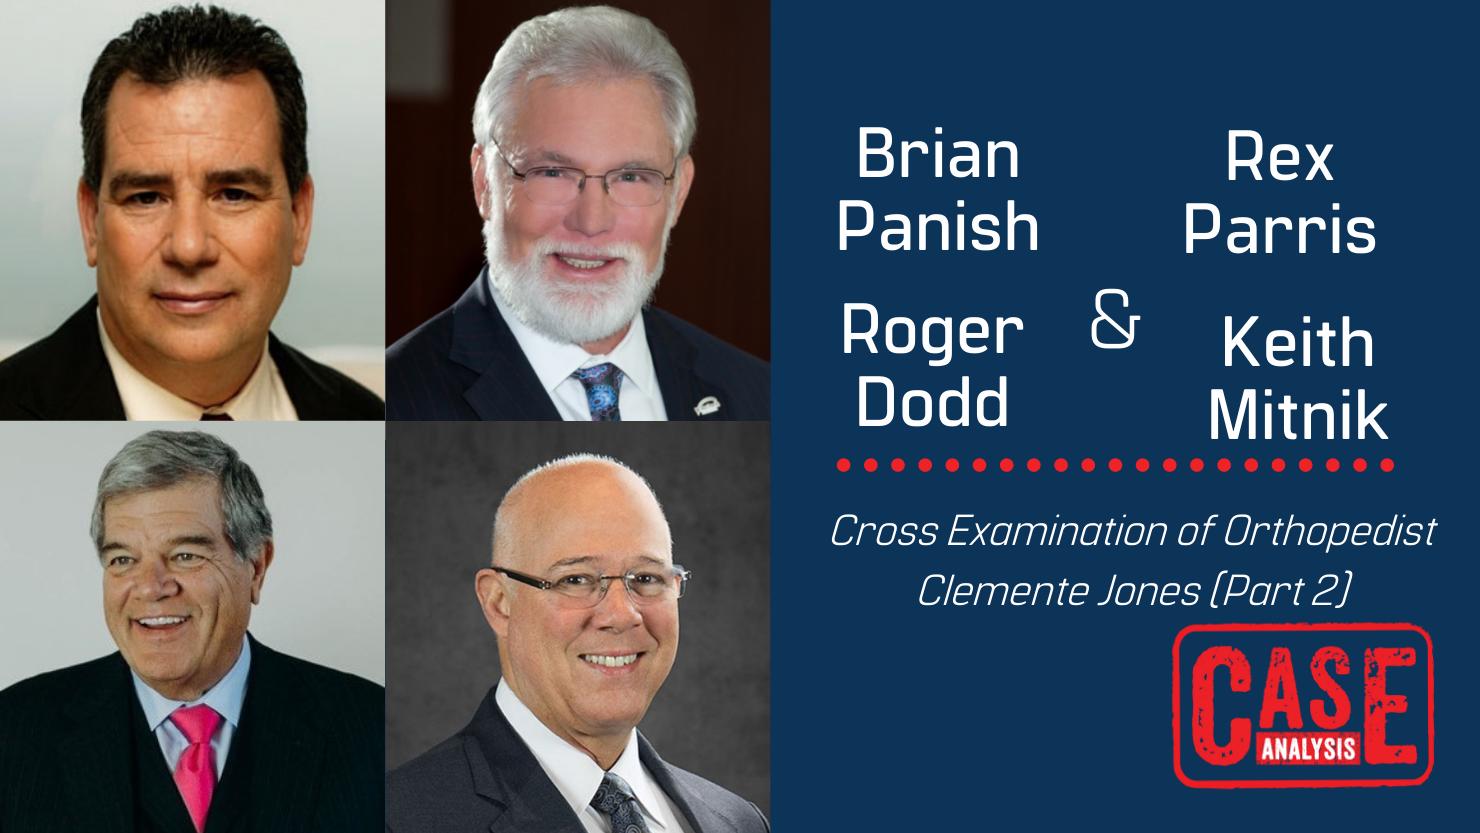 Brian Panish, Rex Parris, Roger Dodd & Keith Mitnik - Cross Examination Orthopedist Clemente Jones (Part 2)